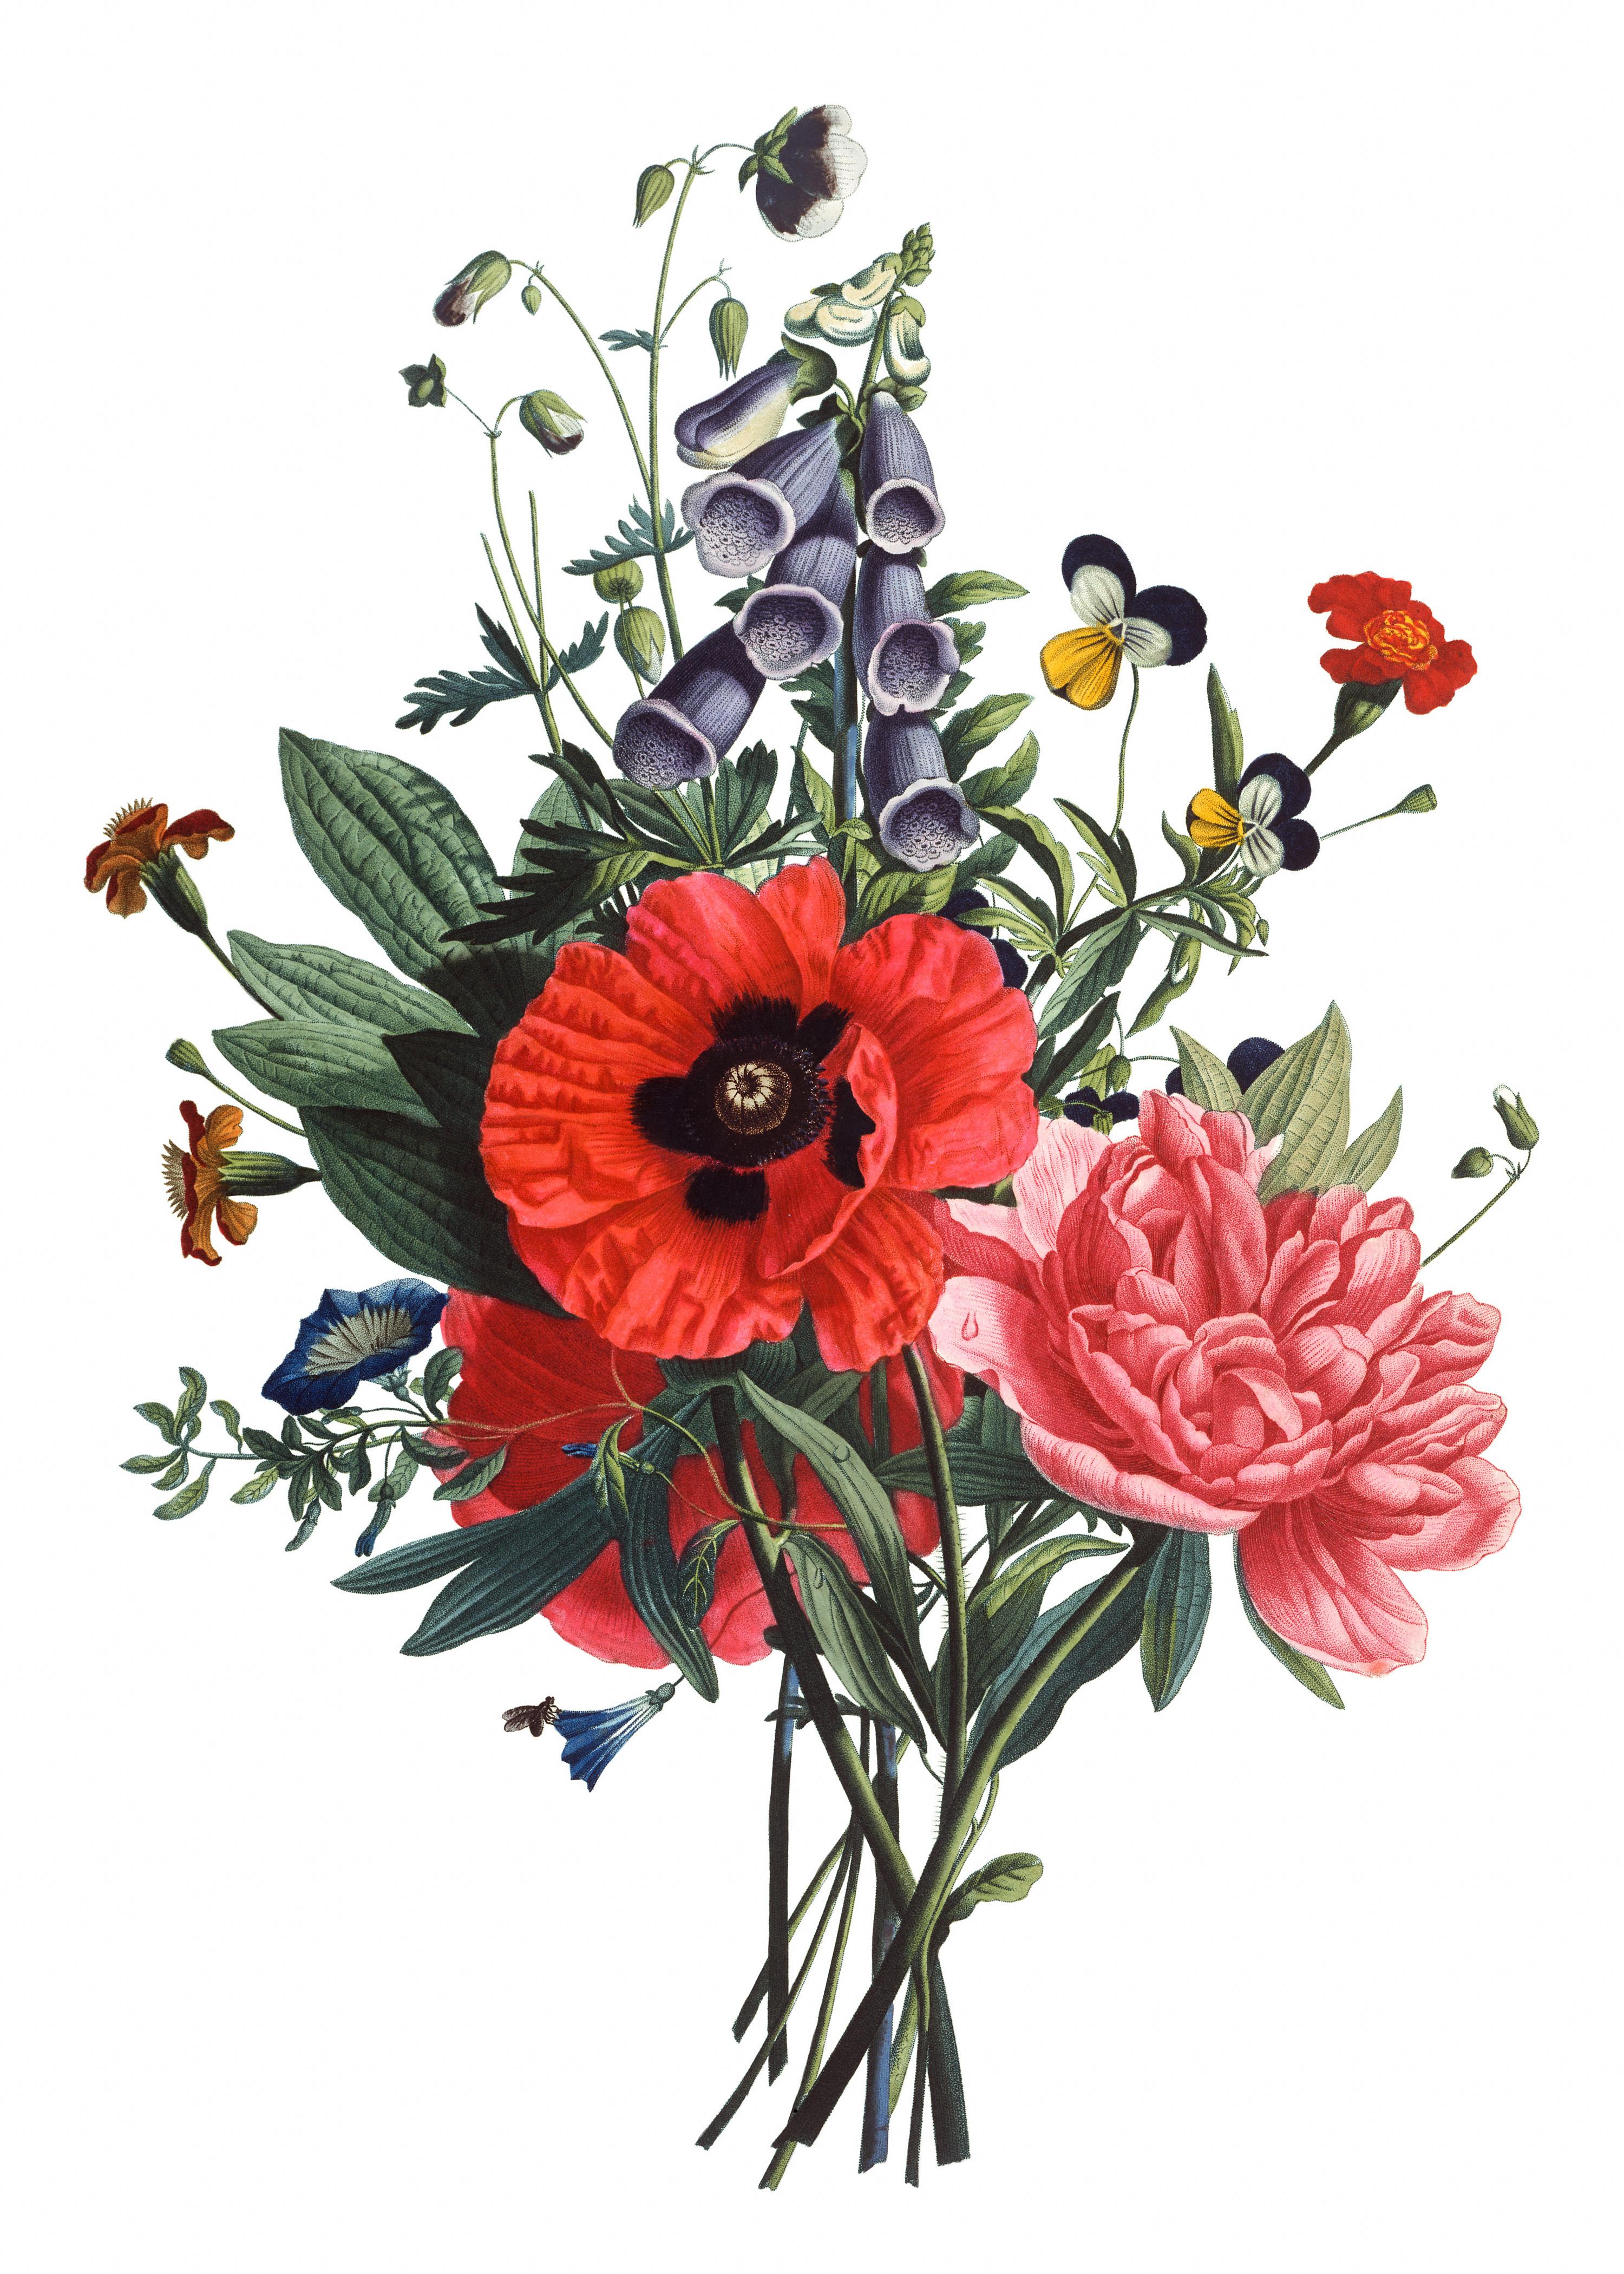 Vintage floral images free clip art library stock 17 Best images about Floral Retro Surrealism Source on Pinterest ... clip art library stock